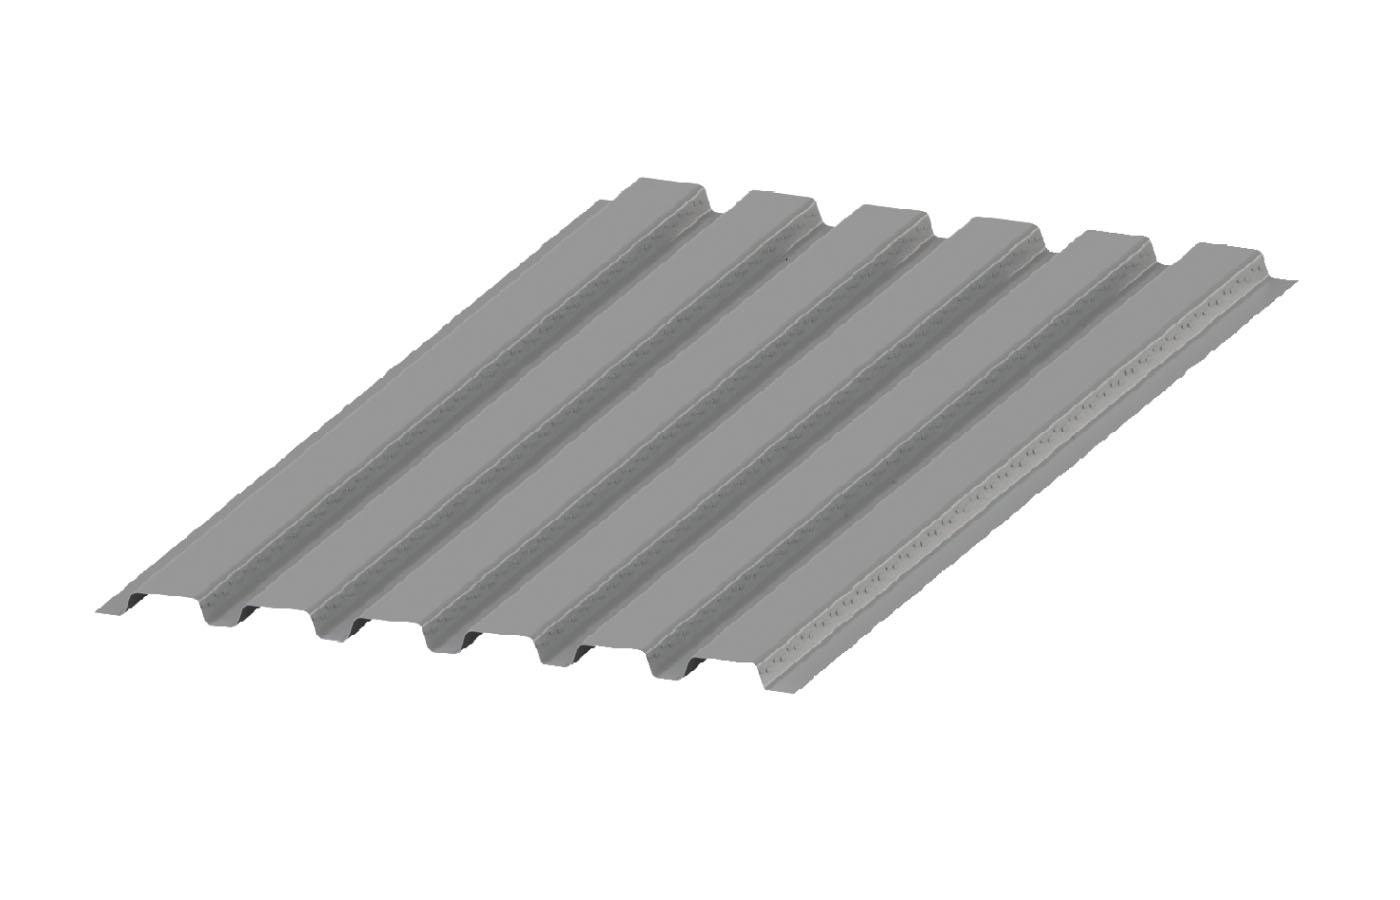 1.5 VLI Composite Deck